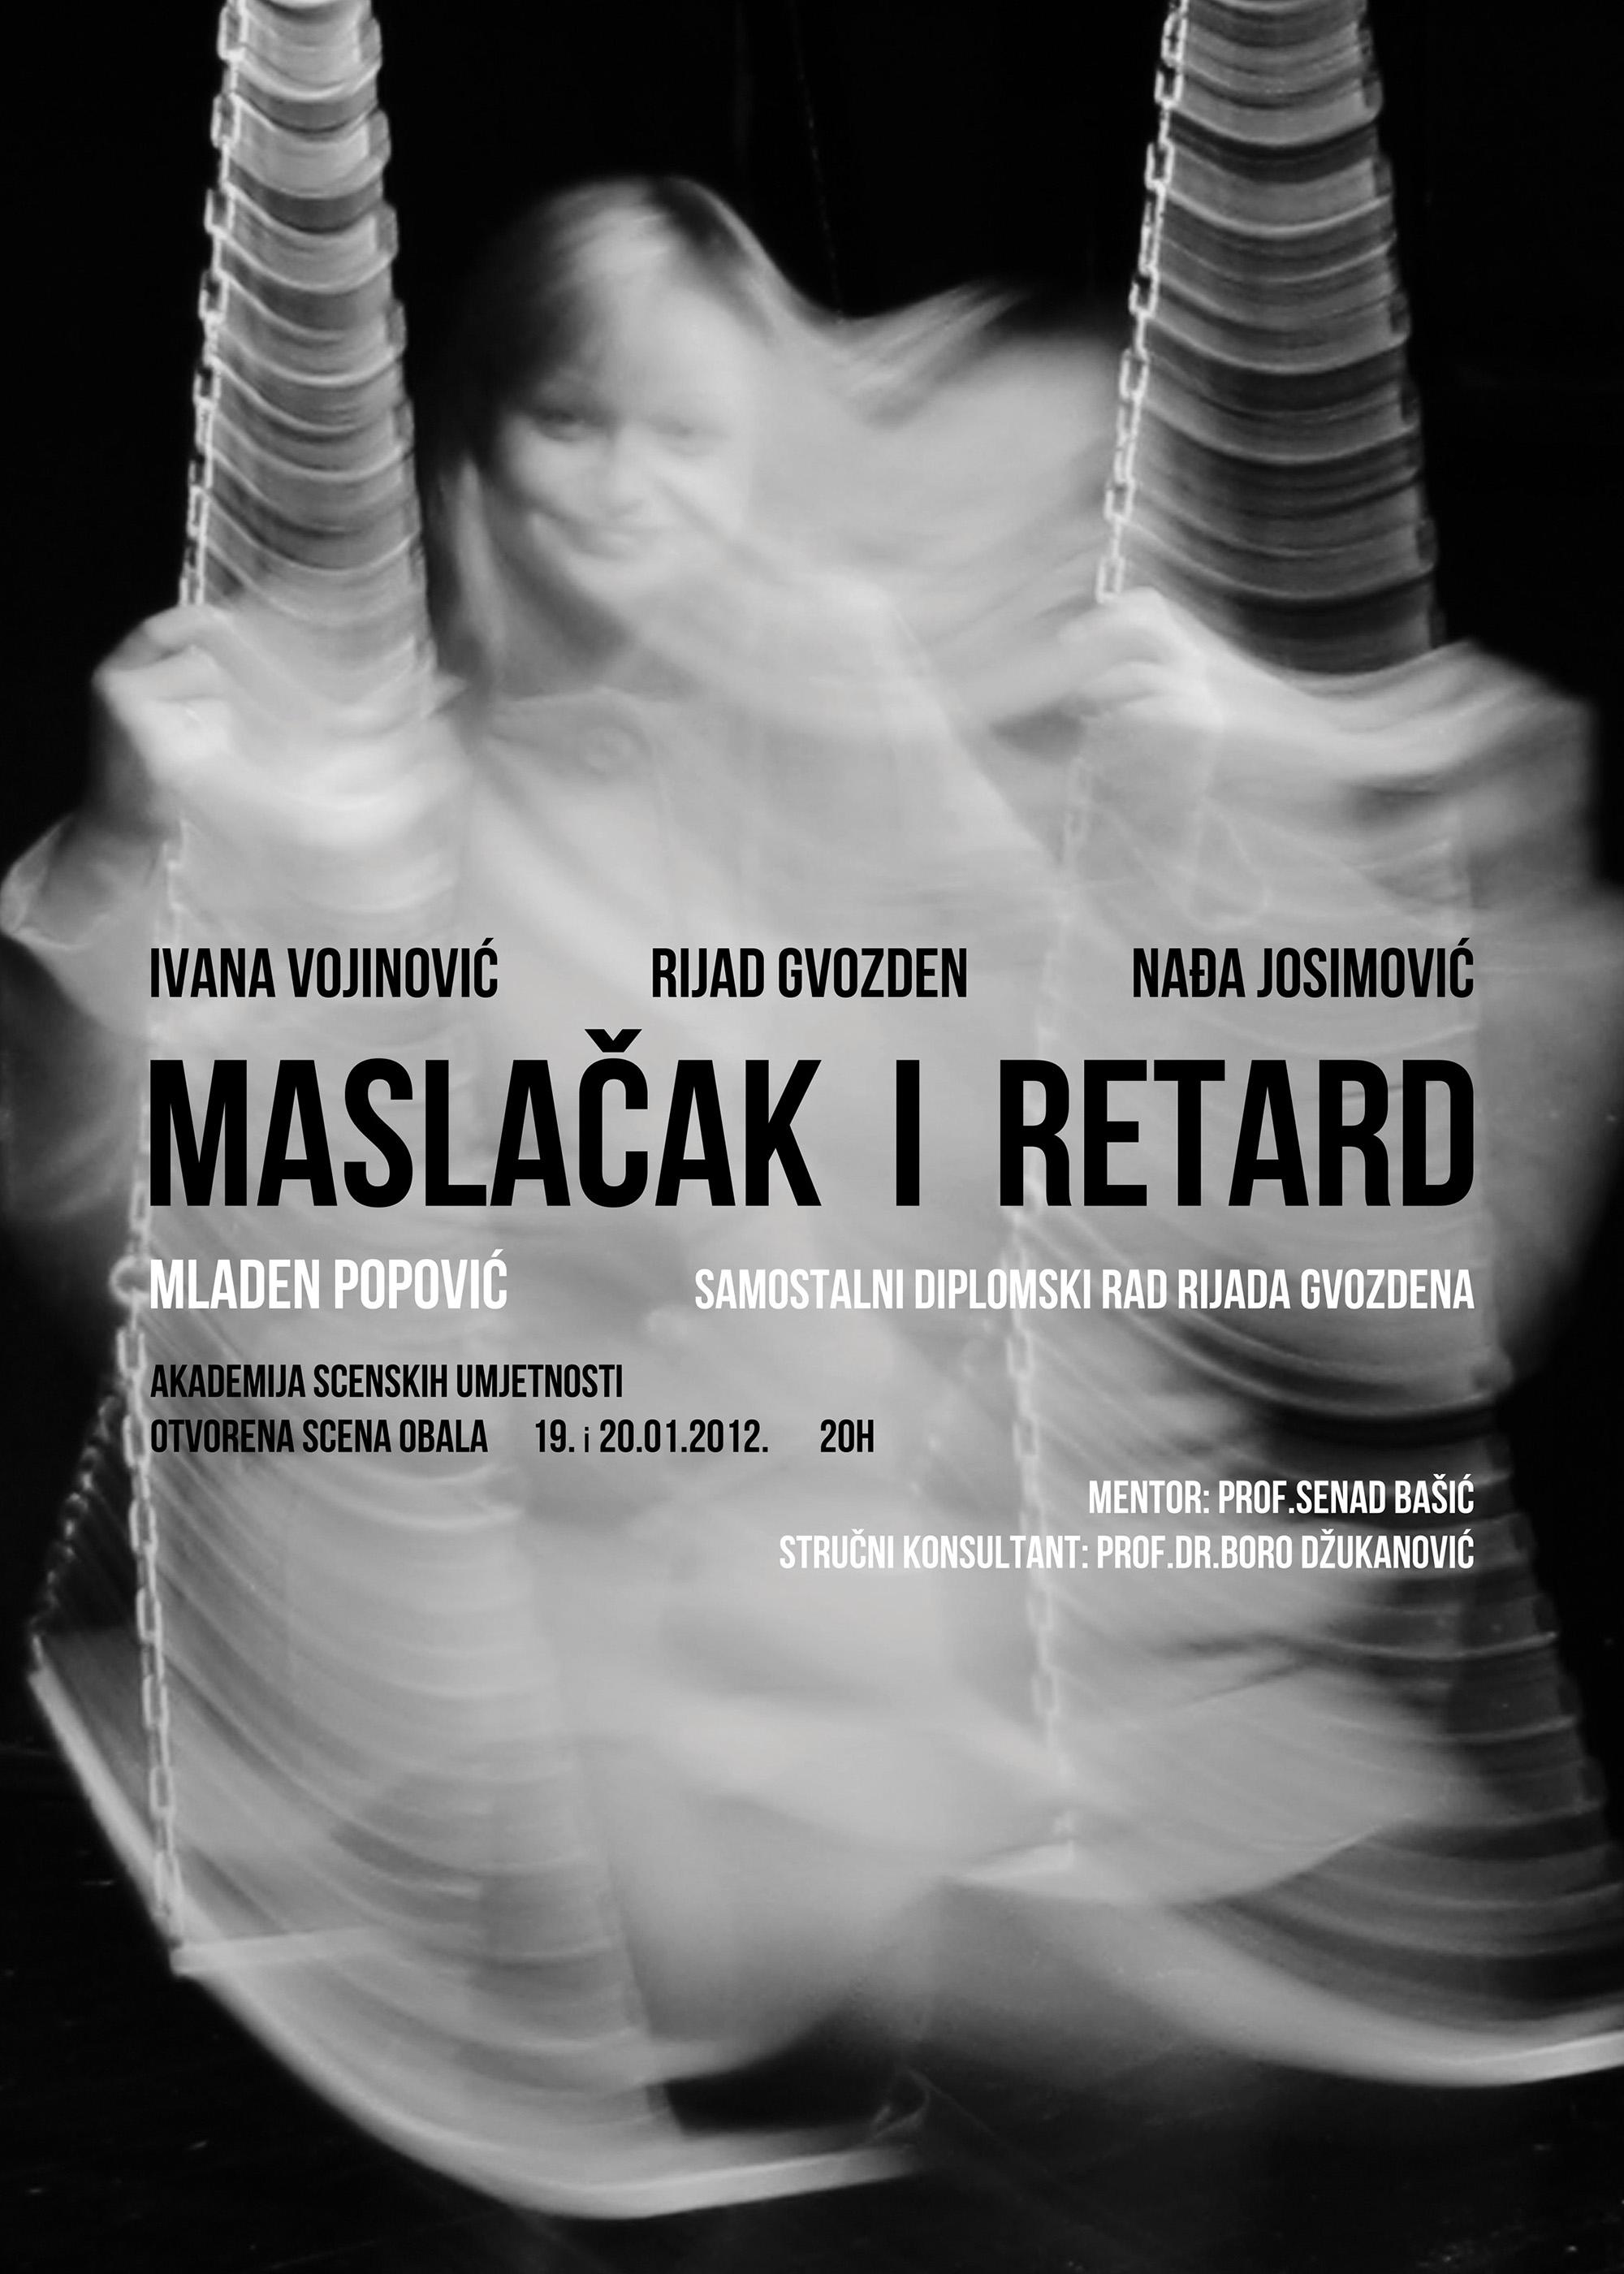 maslacak_i_retard13.jpg